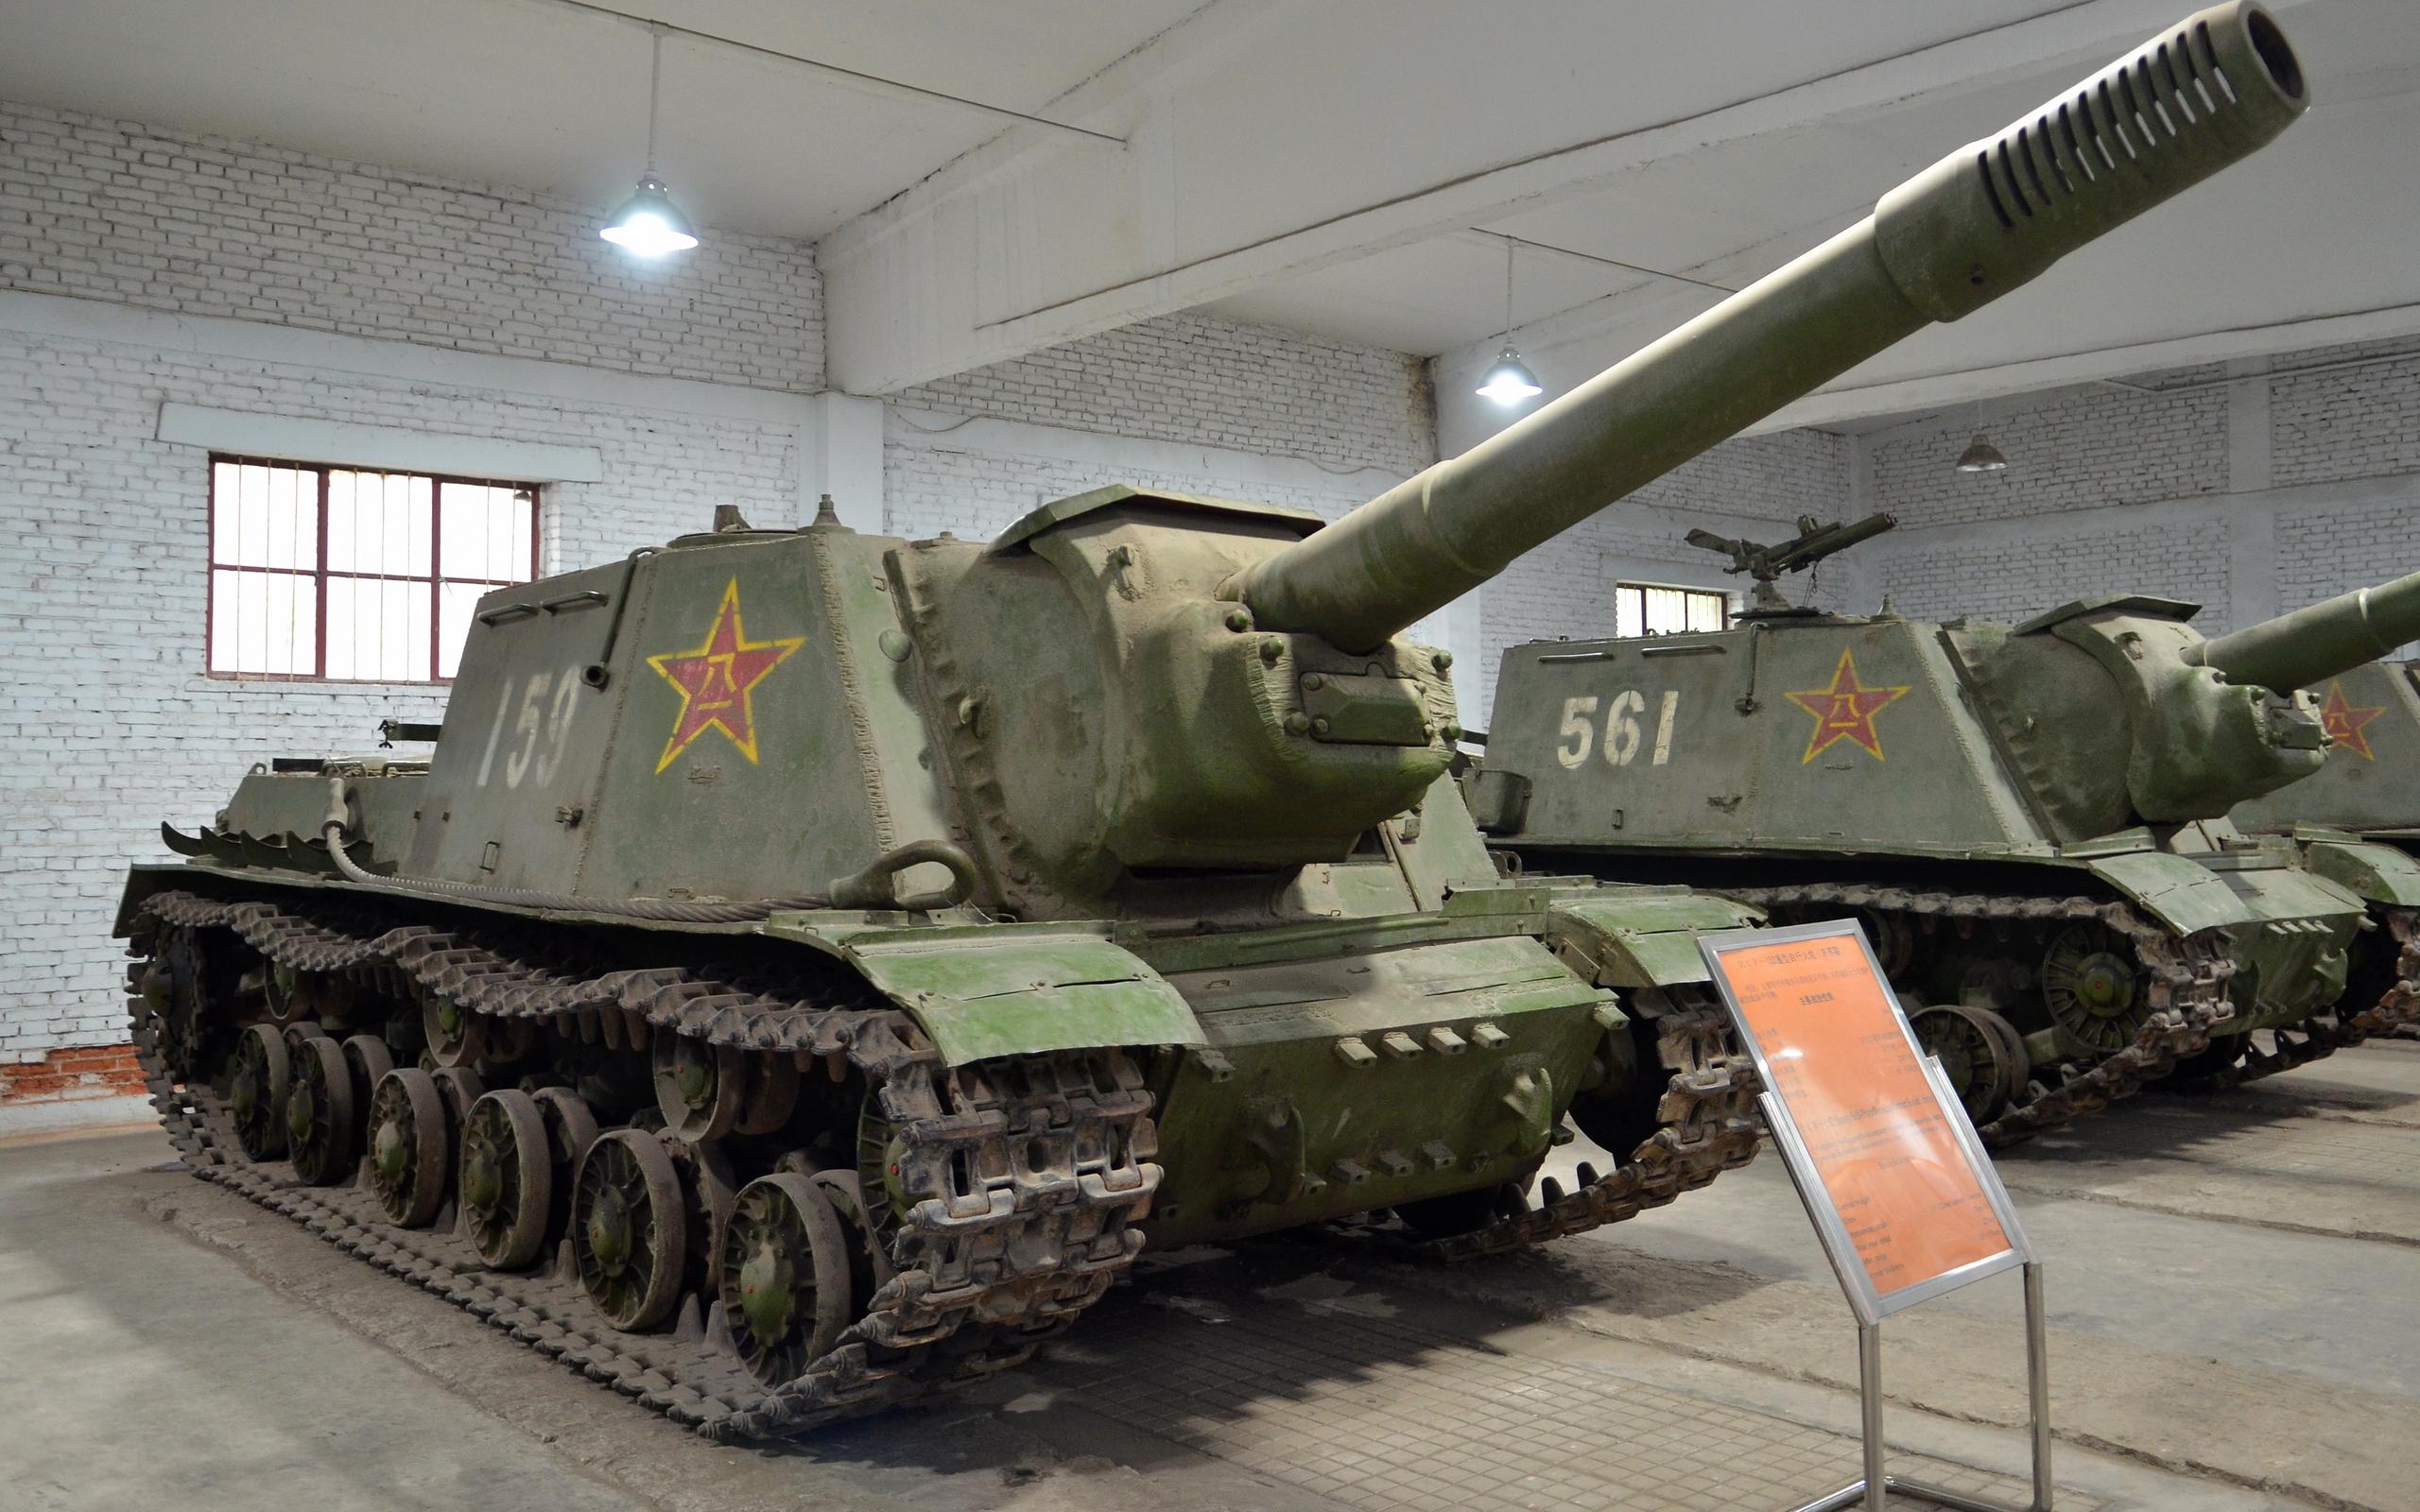 Pair of PLA ISU-152s preserved in a museum in Beijing.